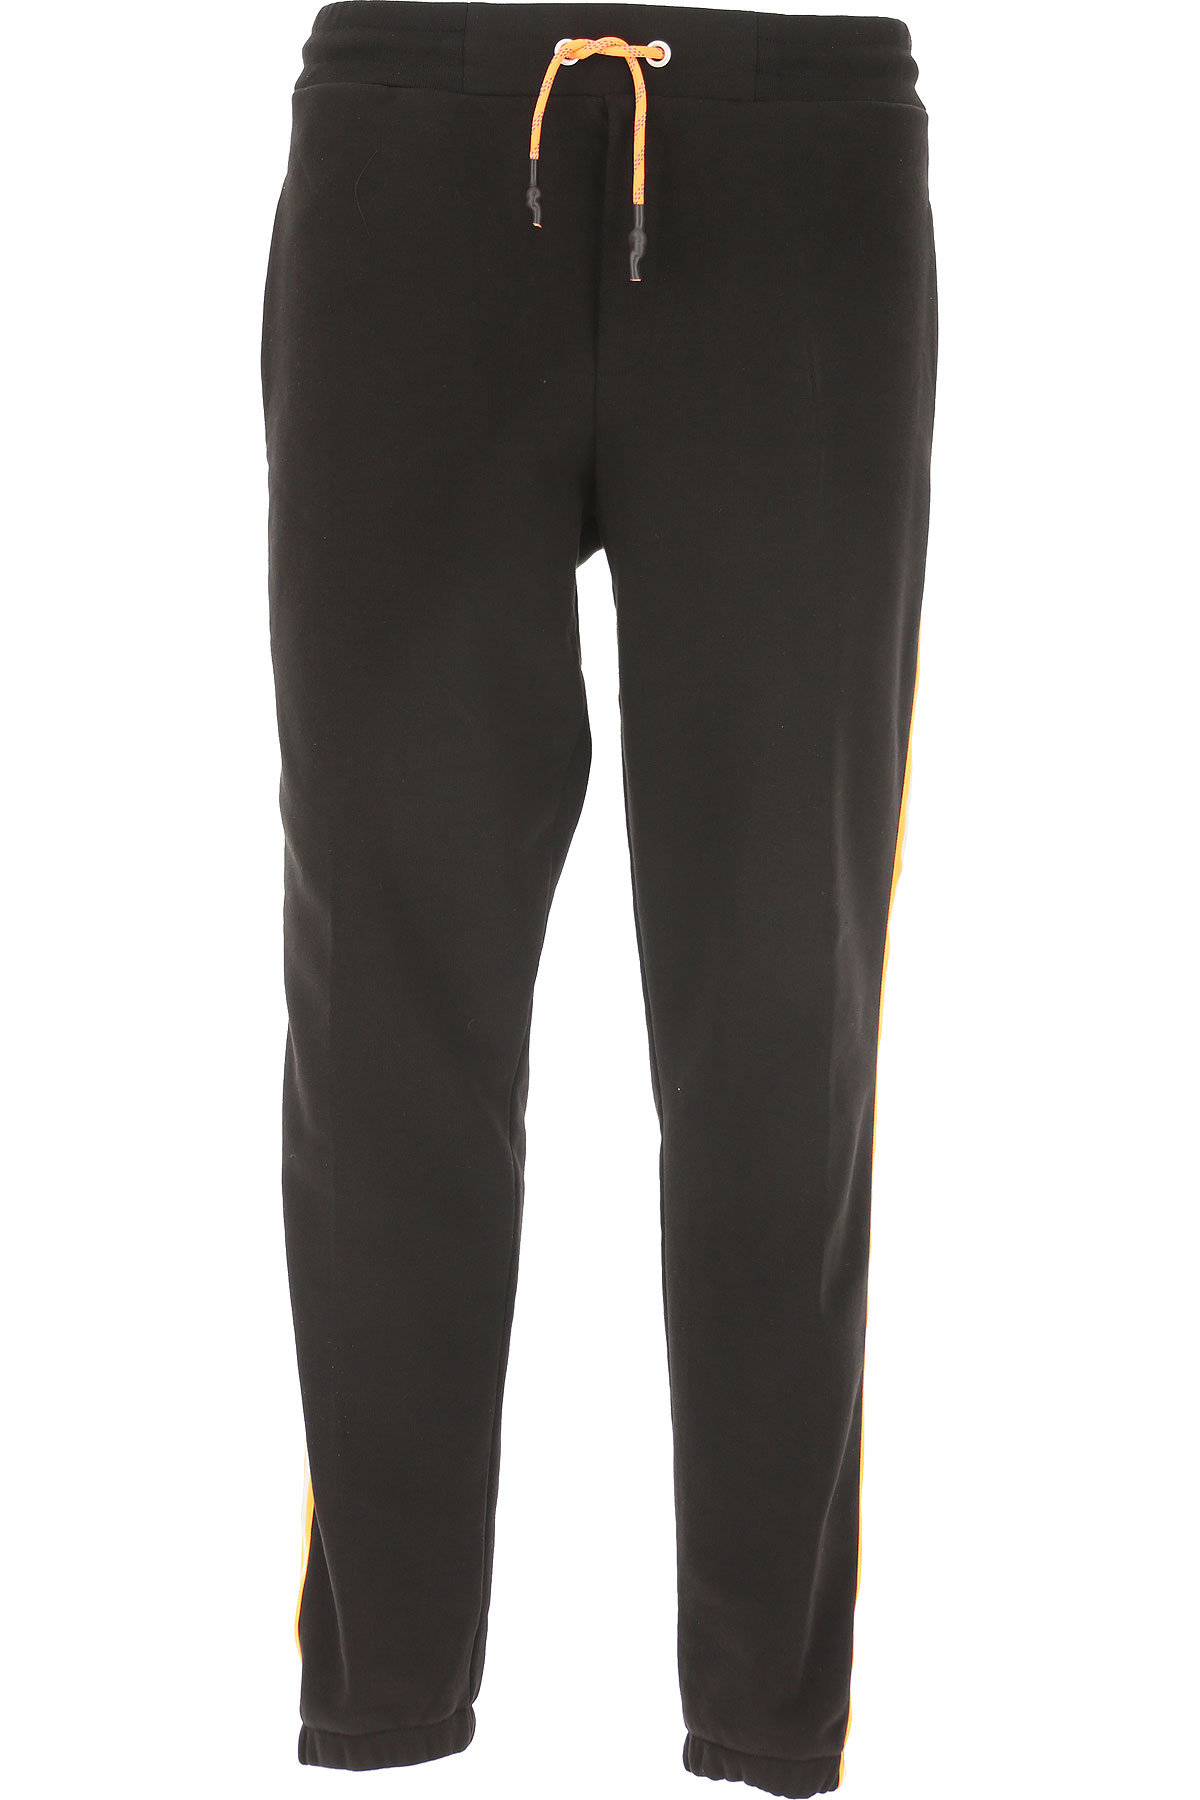 Alexander McQueen McQ Pants for Men On Sale in Outlet, Black, Cotton, 2019, L M S